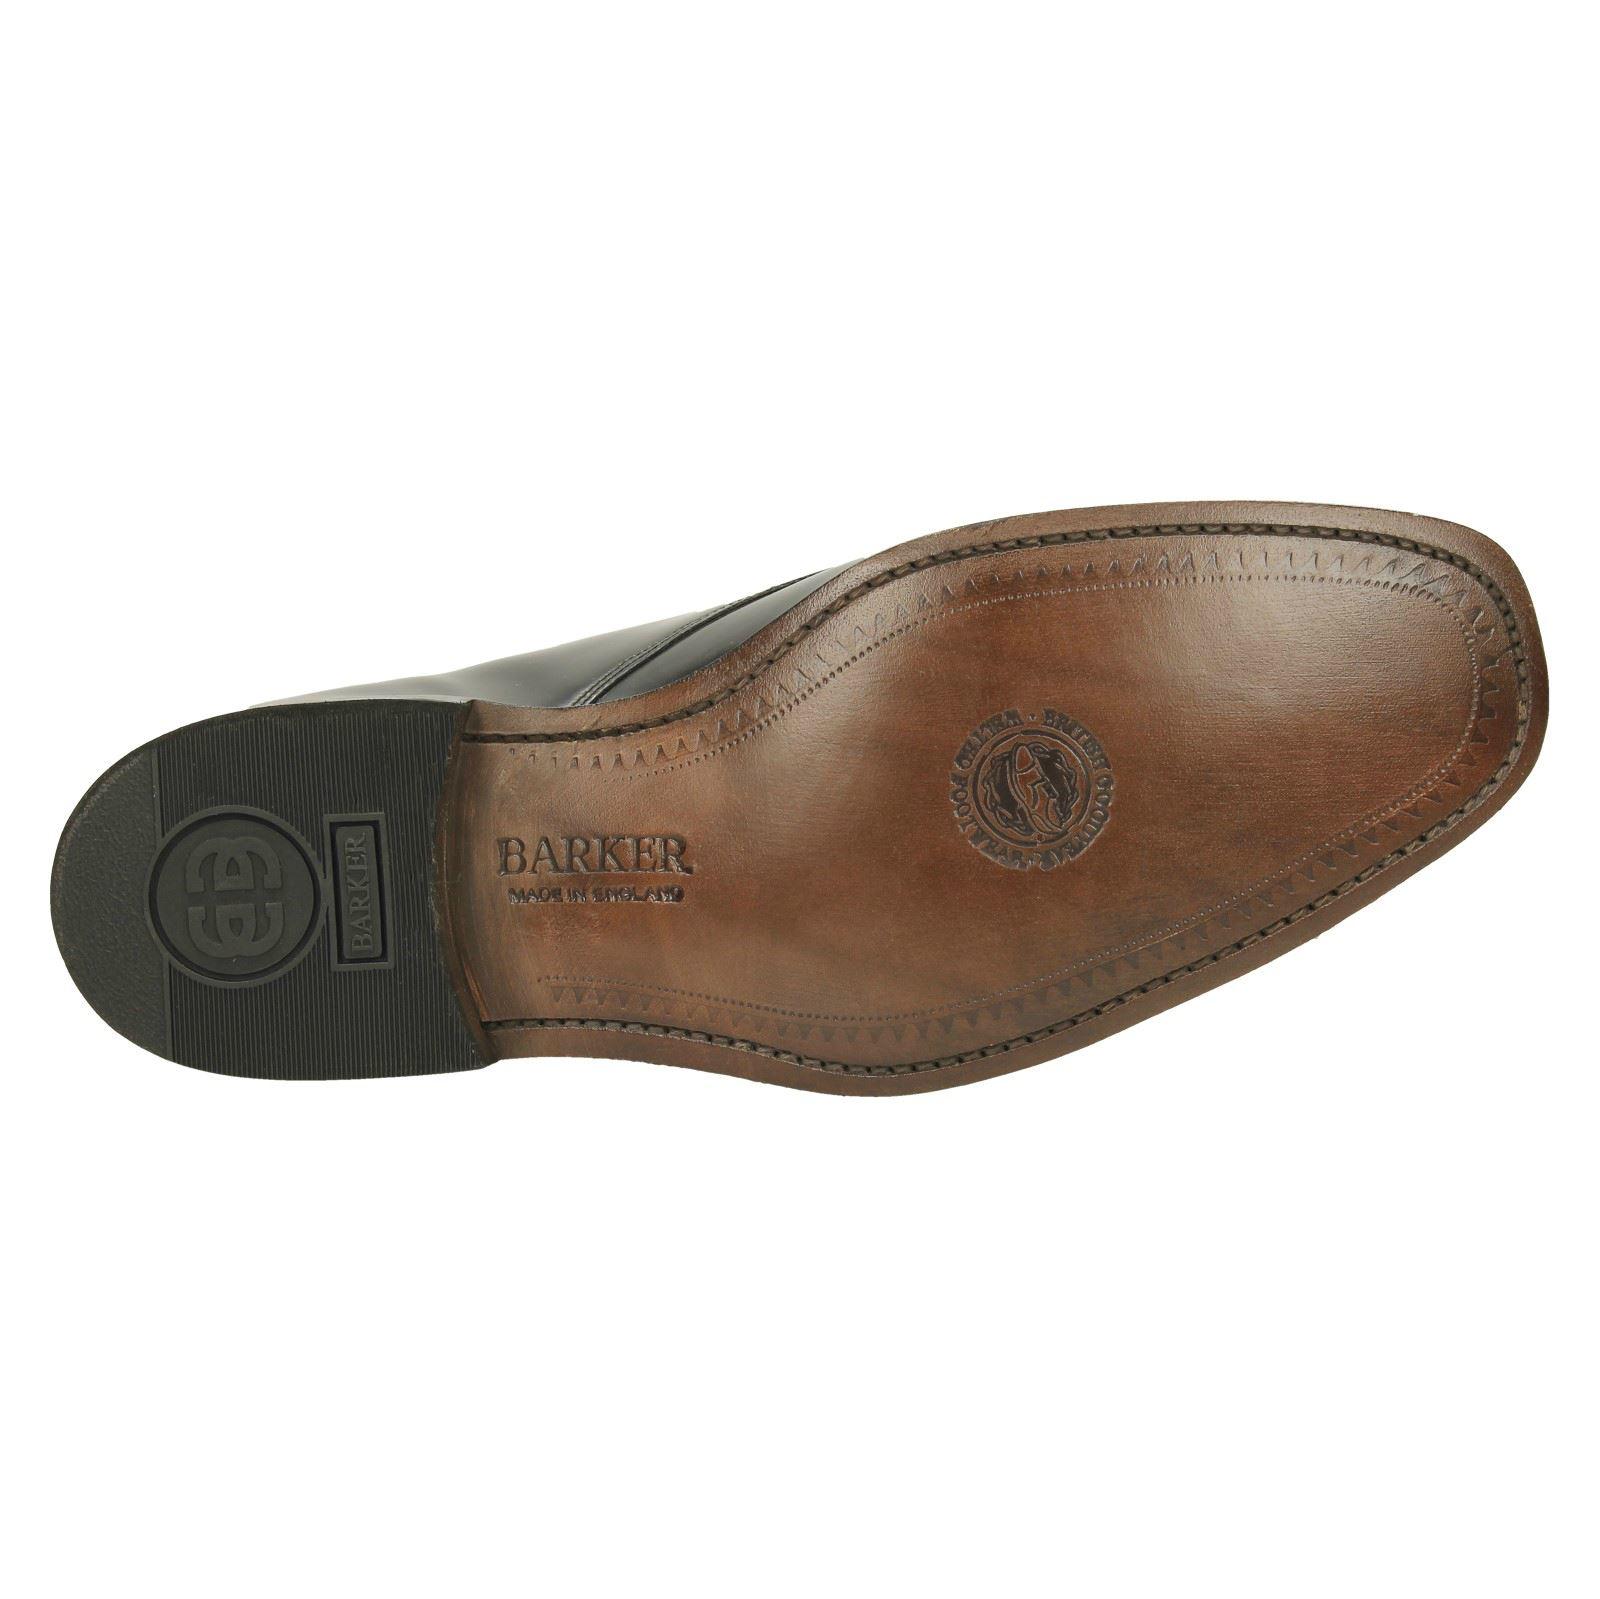 Mens Barker Lace Up Up Lace Shoes Dwight c16038